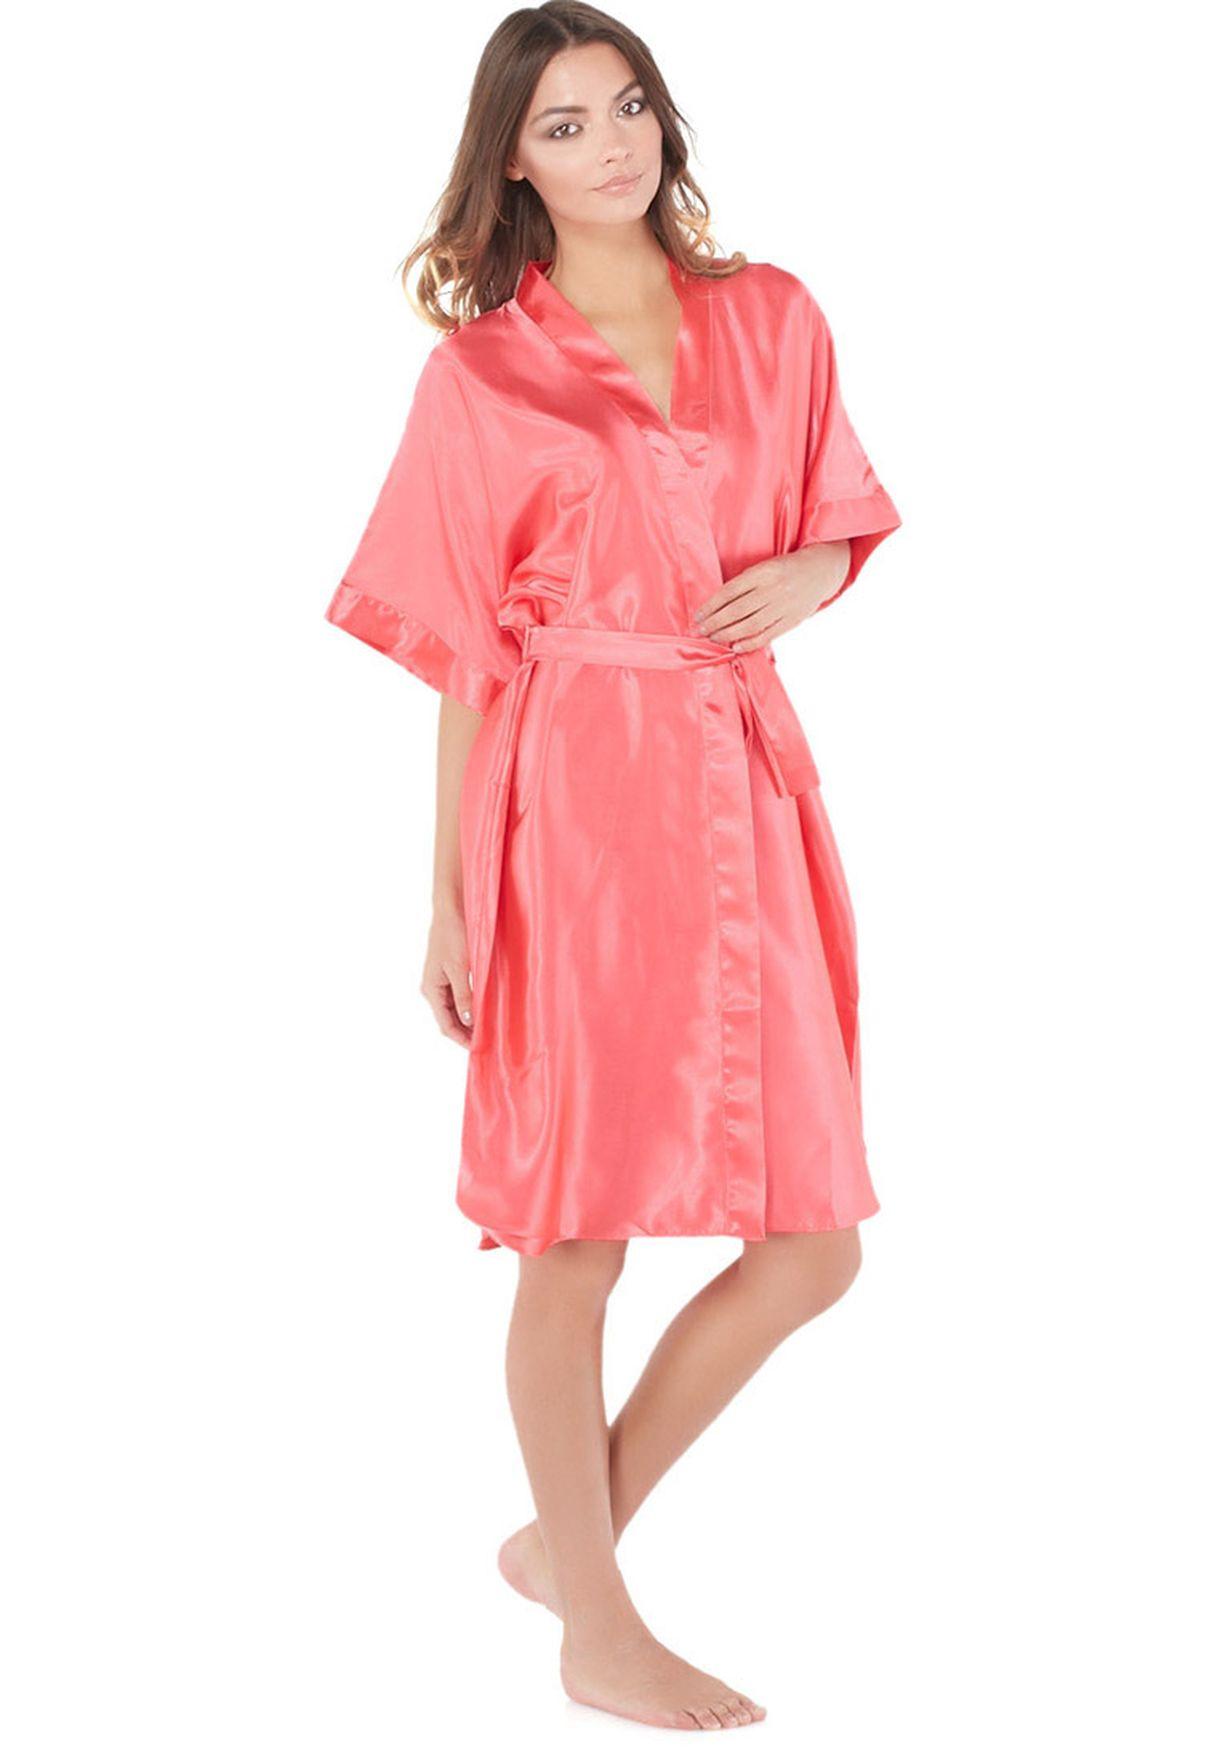 Shop Brassi Belweiss pink Dressing Gown Robe for Women in Saudi ...